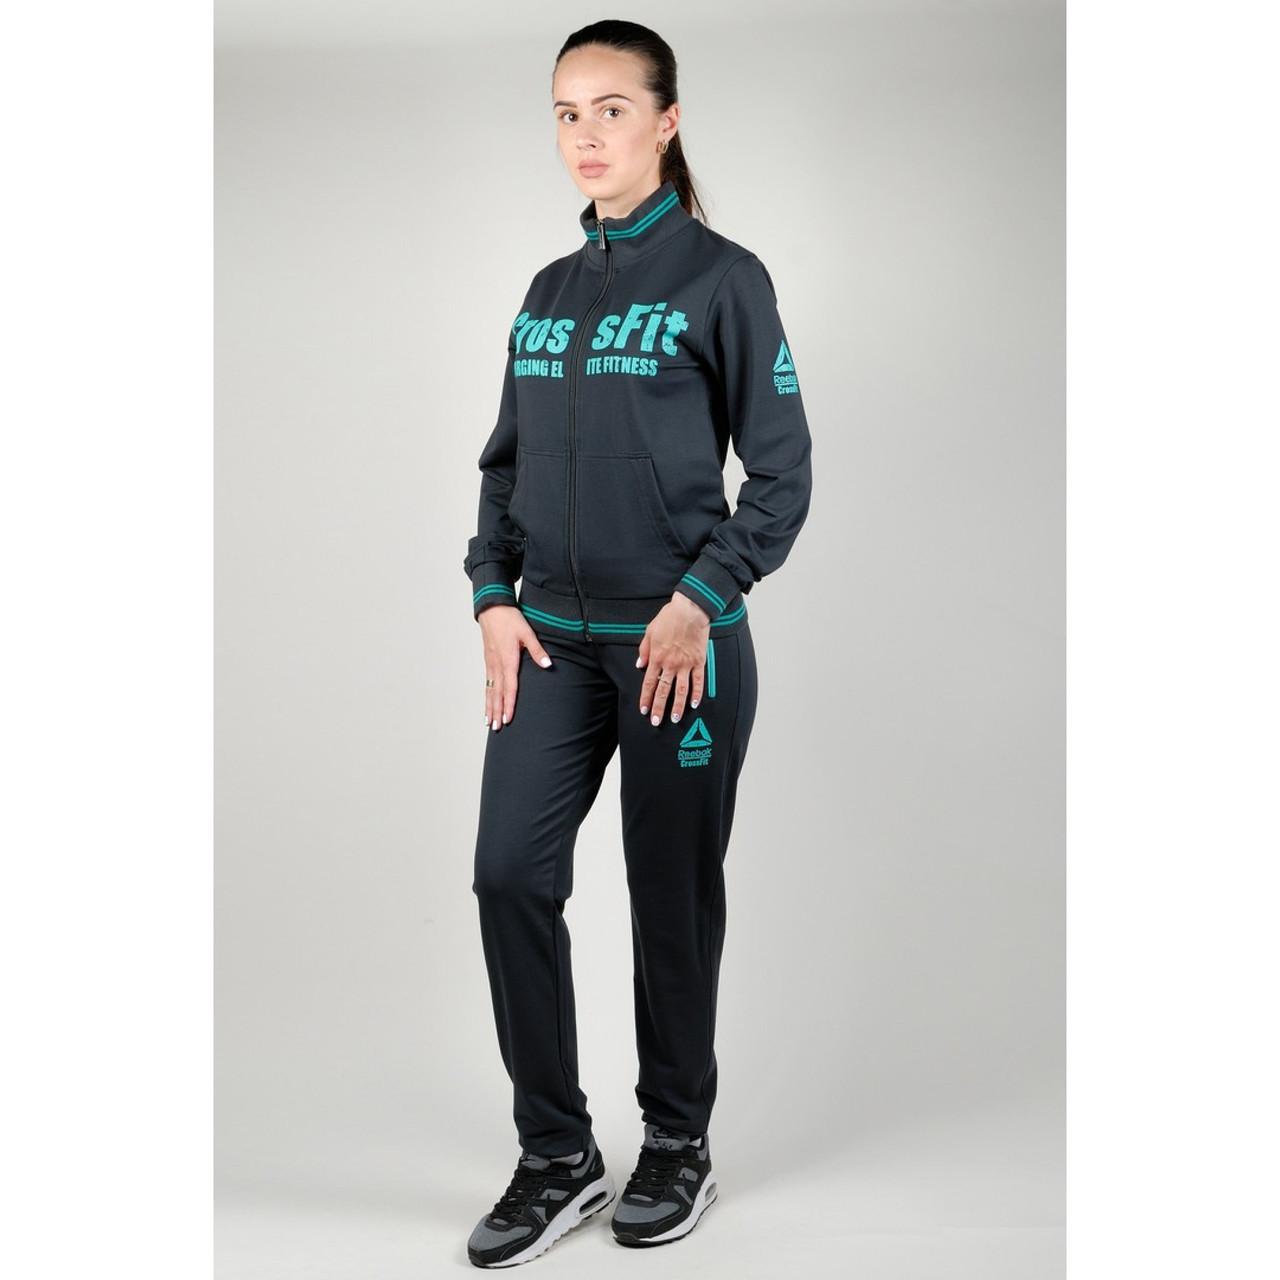 Женский спортивный костюм Reebok Crossfit - Интернет-магазин zakyt.com -  ЗАКУТКОМ. Доставка a6cdba8e5589e